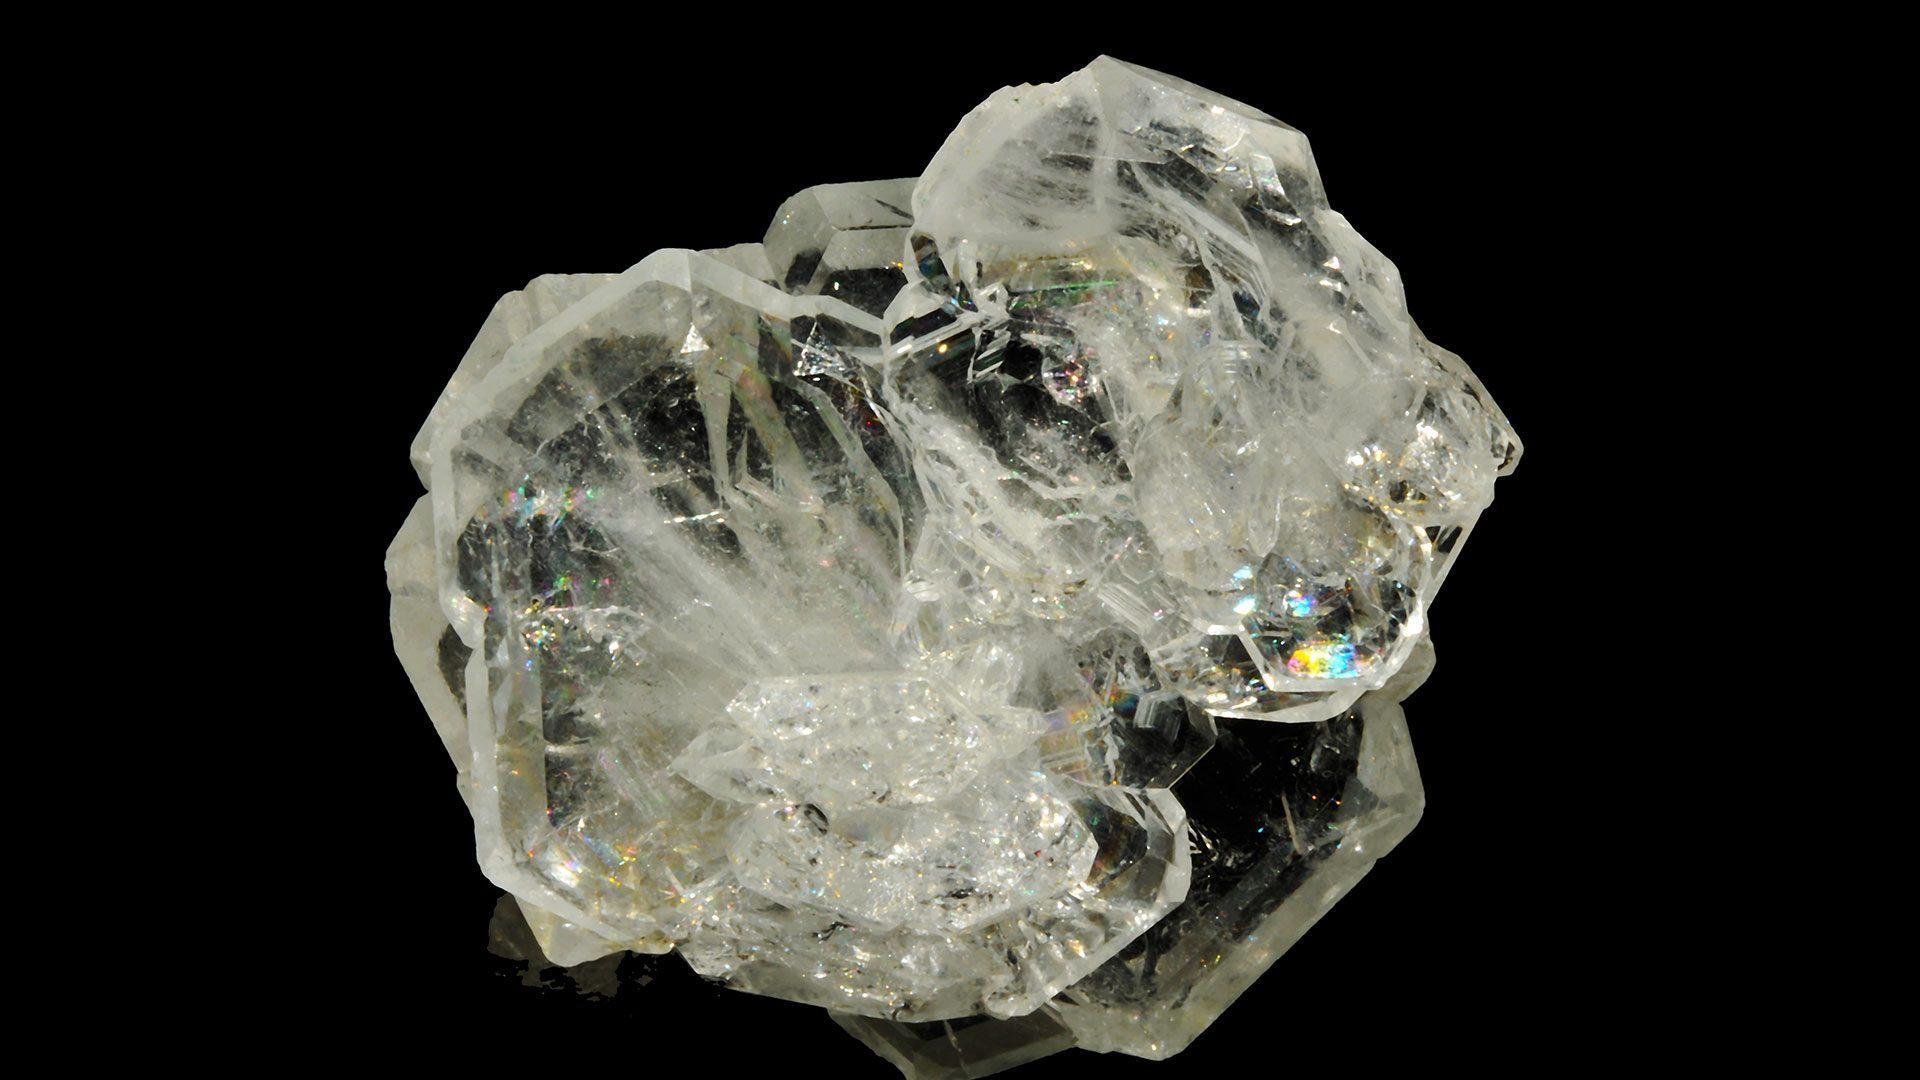 Terminated Goshenite Crystal Specimen - Photograph by Parent Géry